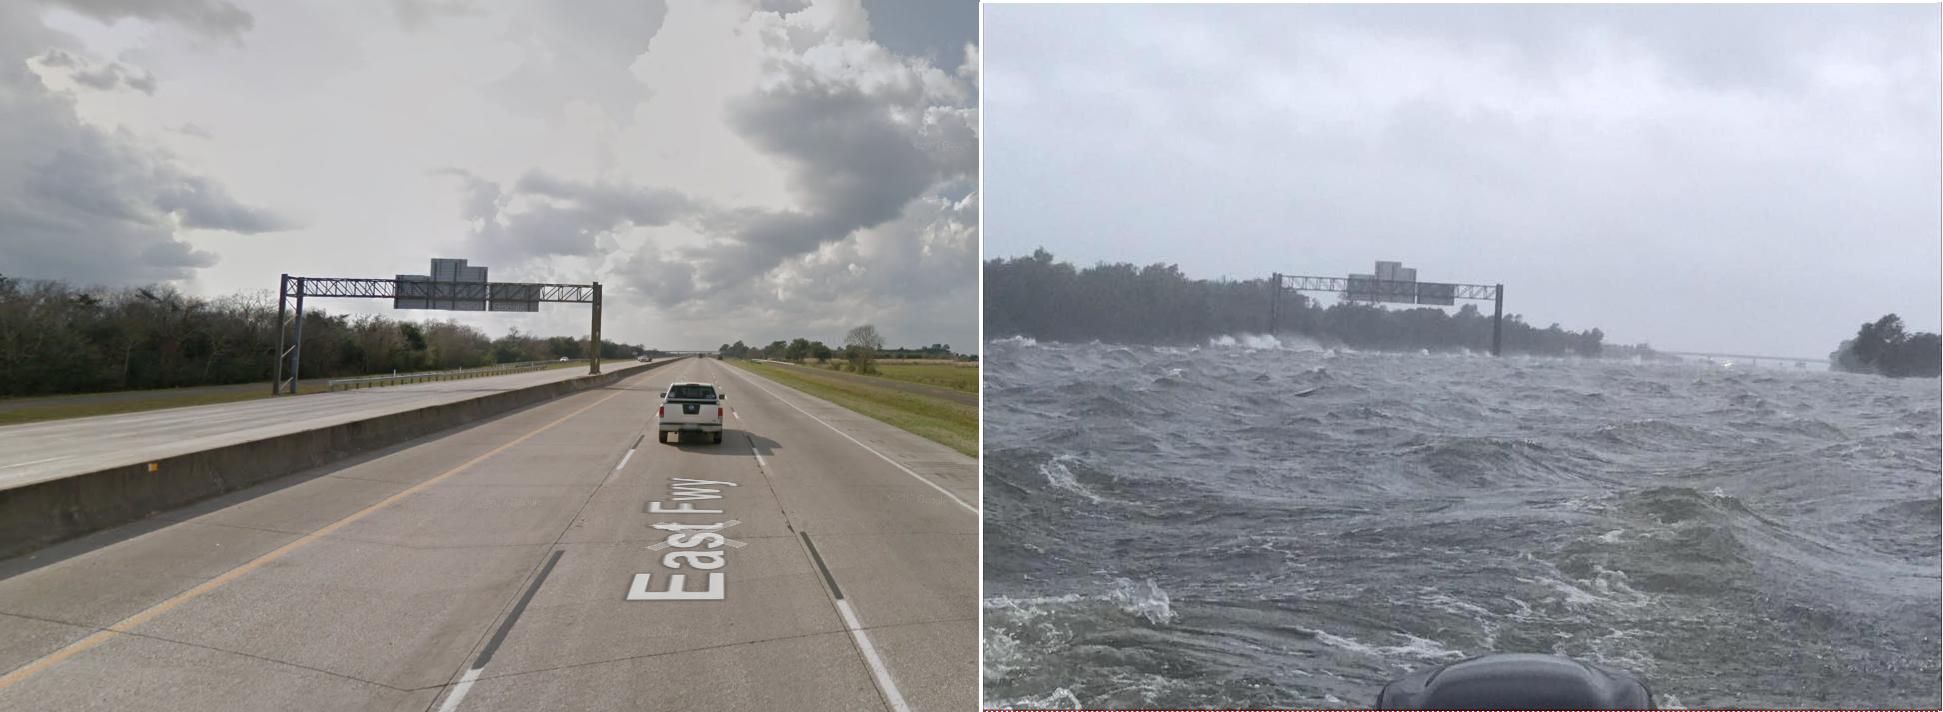 I-10 Freeway in Winnie, TX